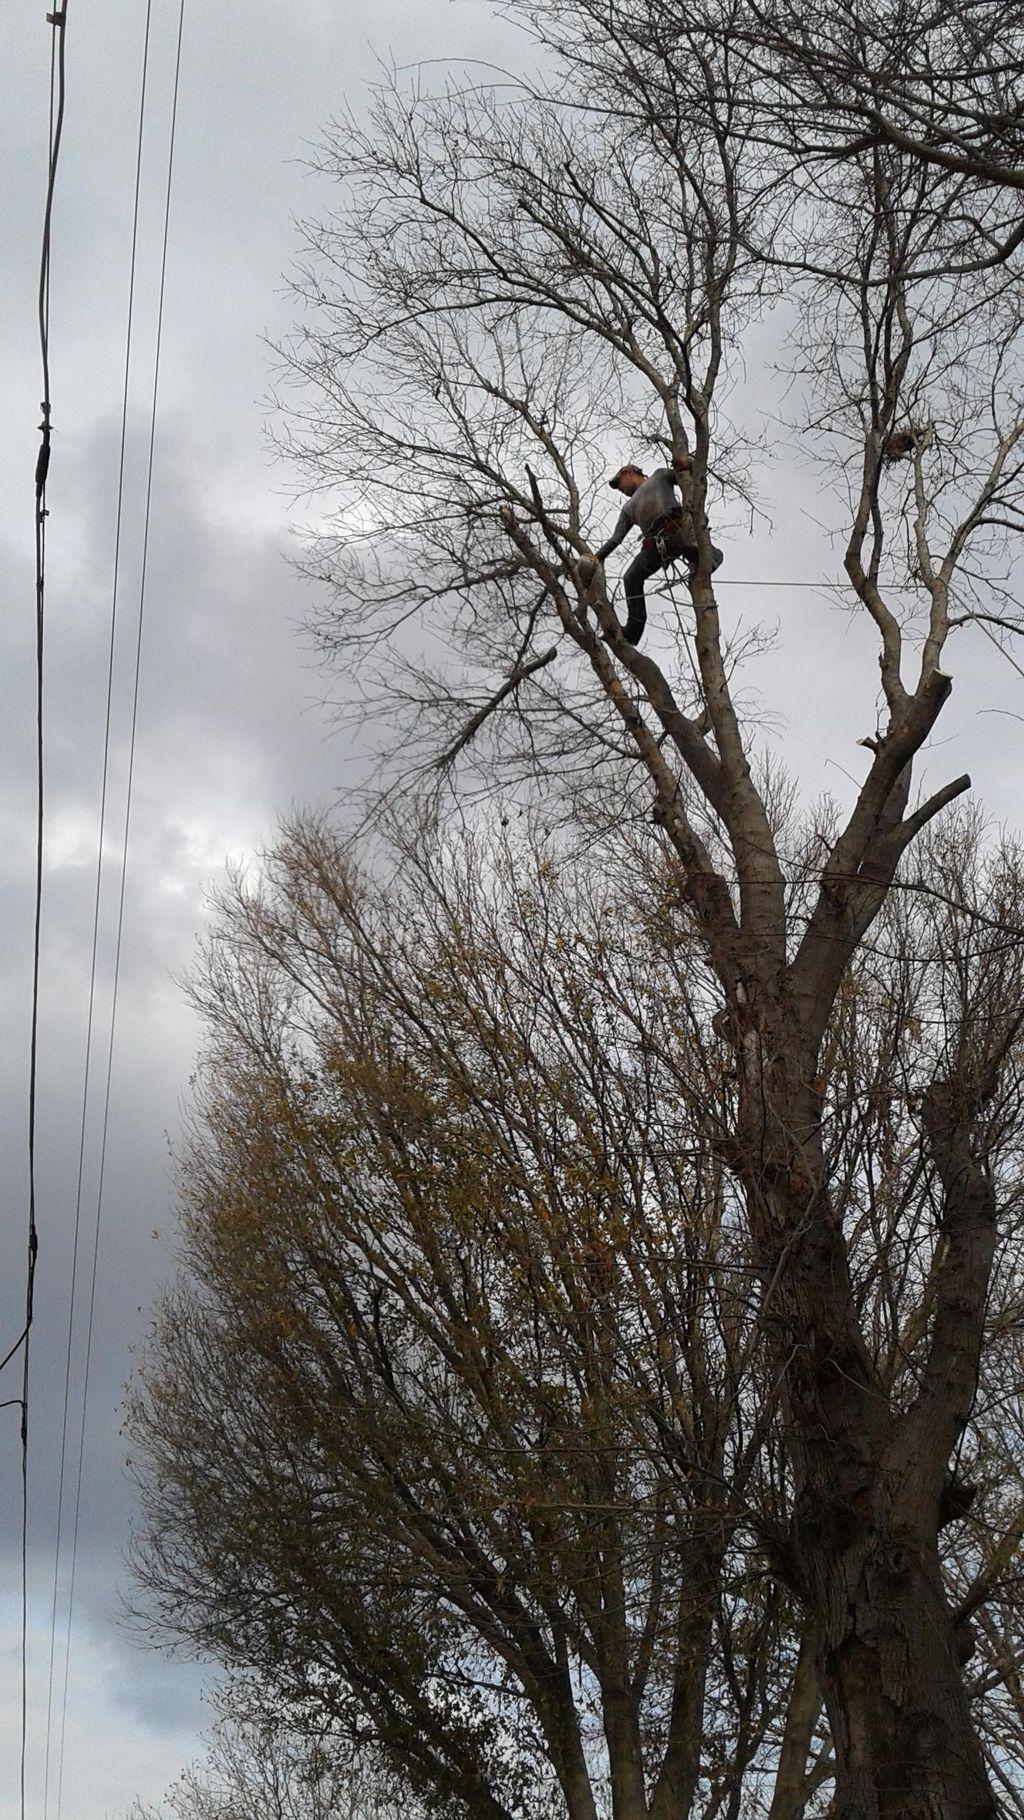 Patino Tree Service